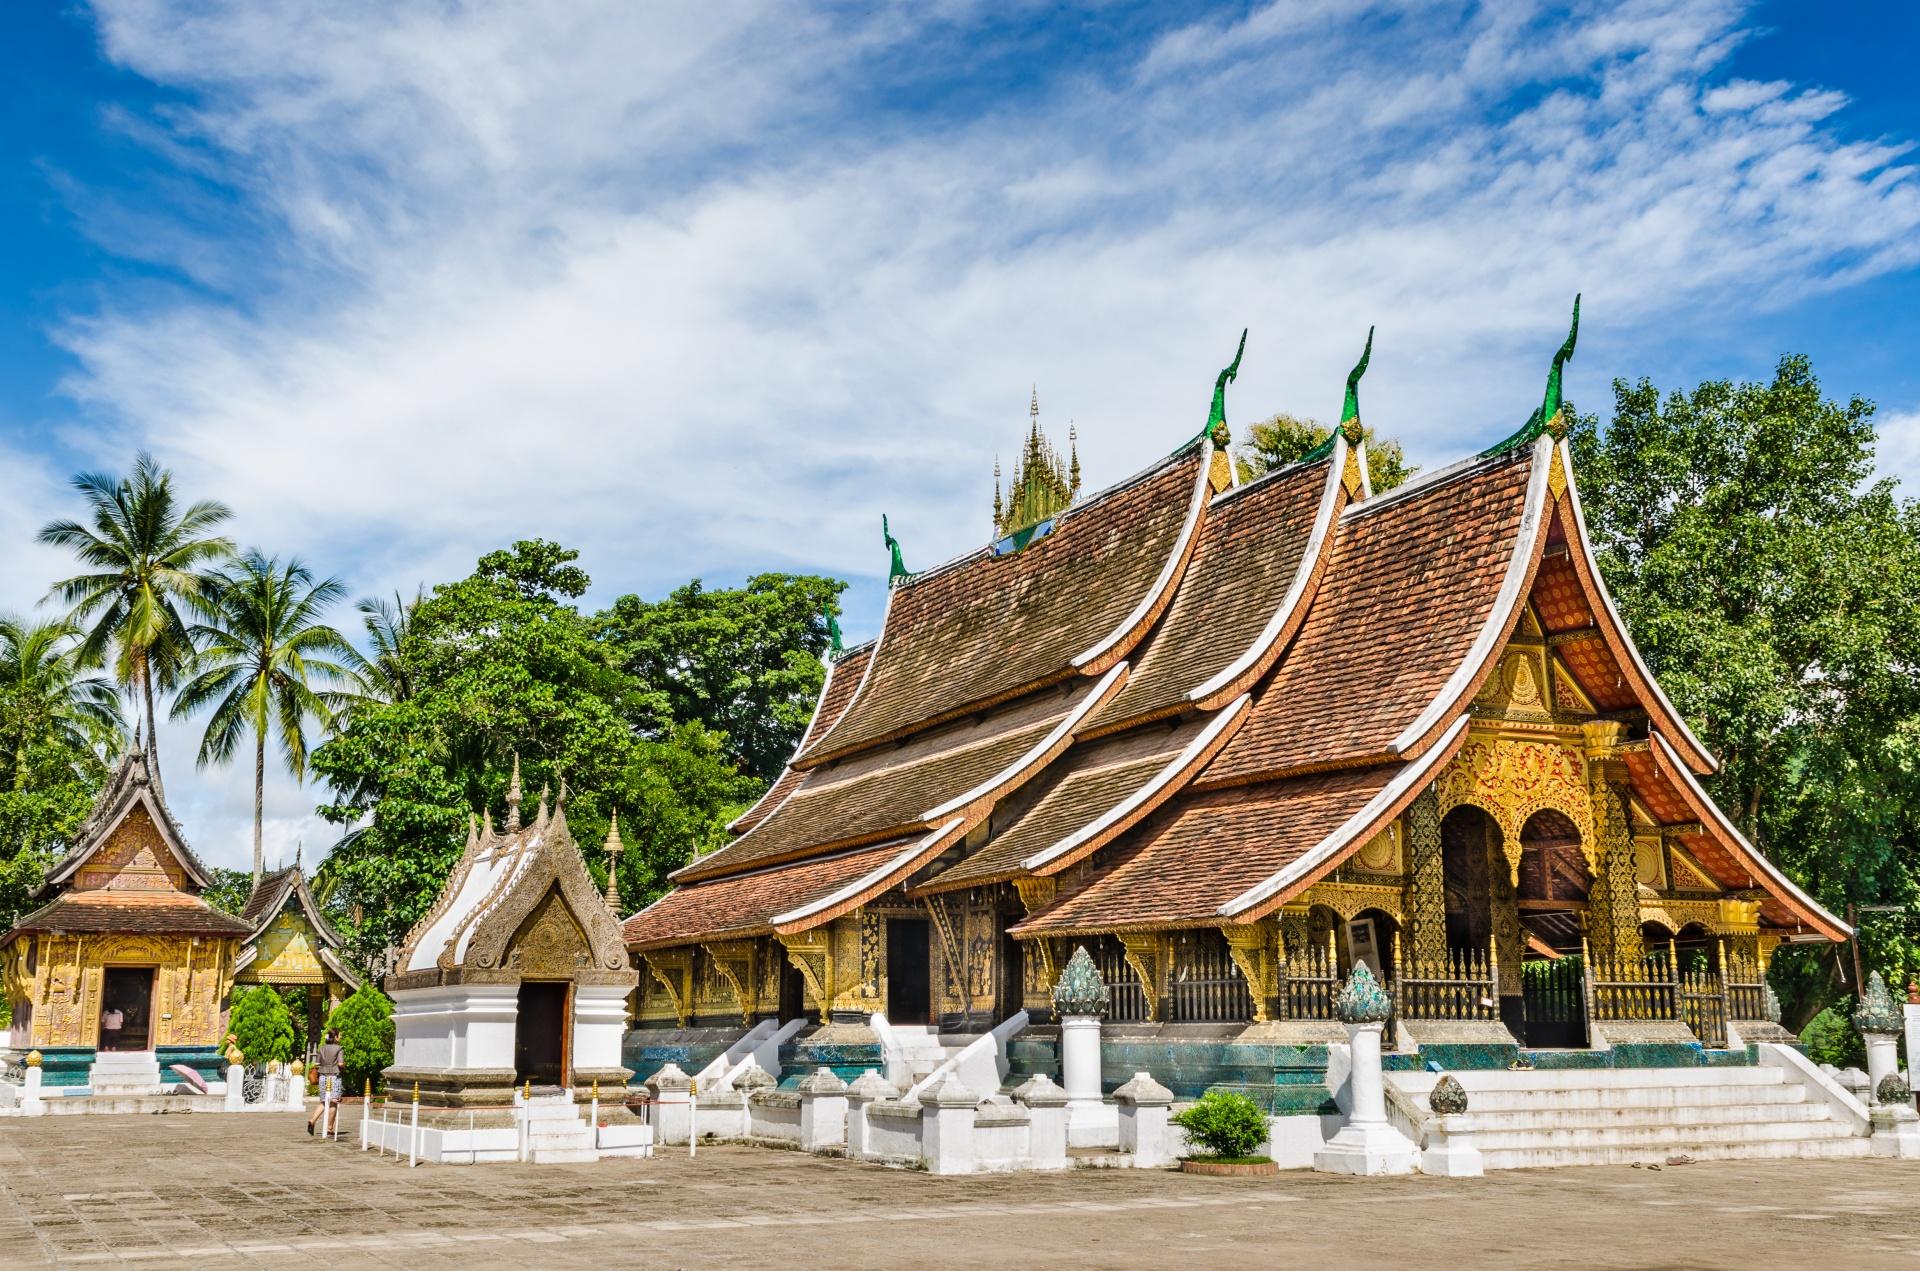 10 cheap destinations from dubai - 7th is refreshing |Wat Xieng Thong Luang Prabang